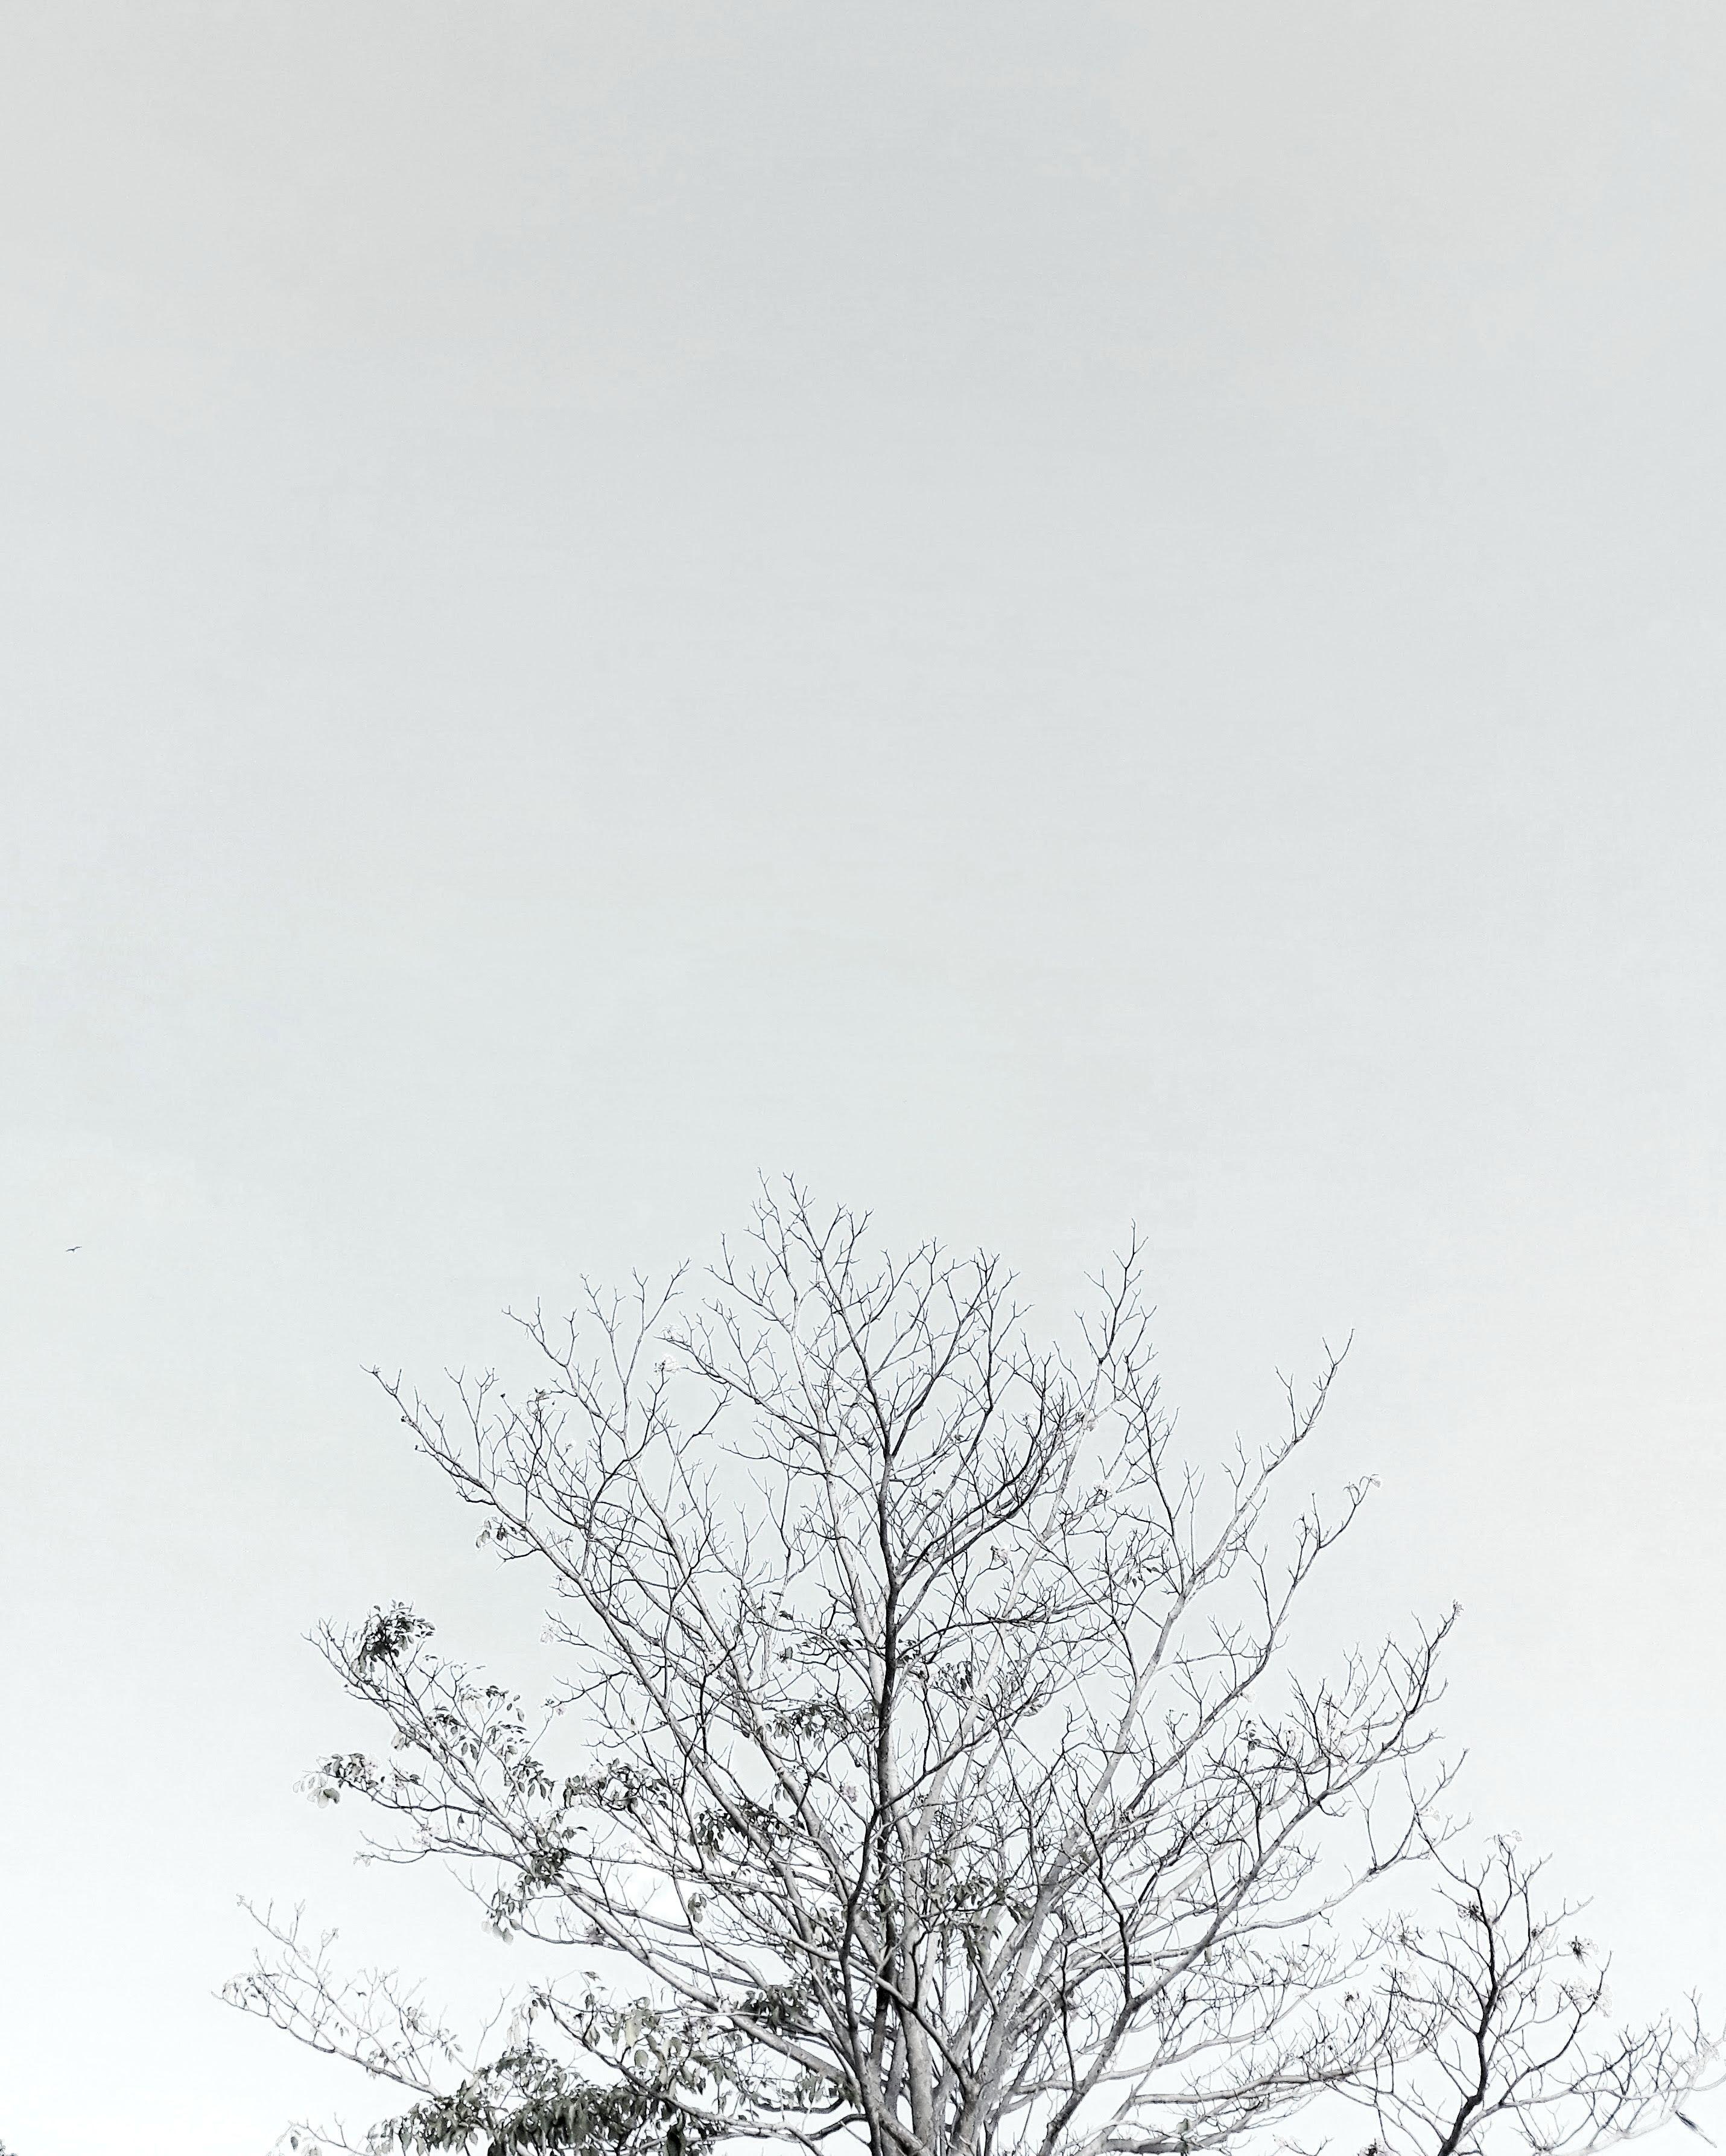 Wow 30 Background Warna Hitam Putih Keren - Koleksi Rial